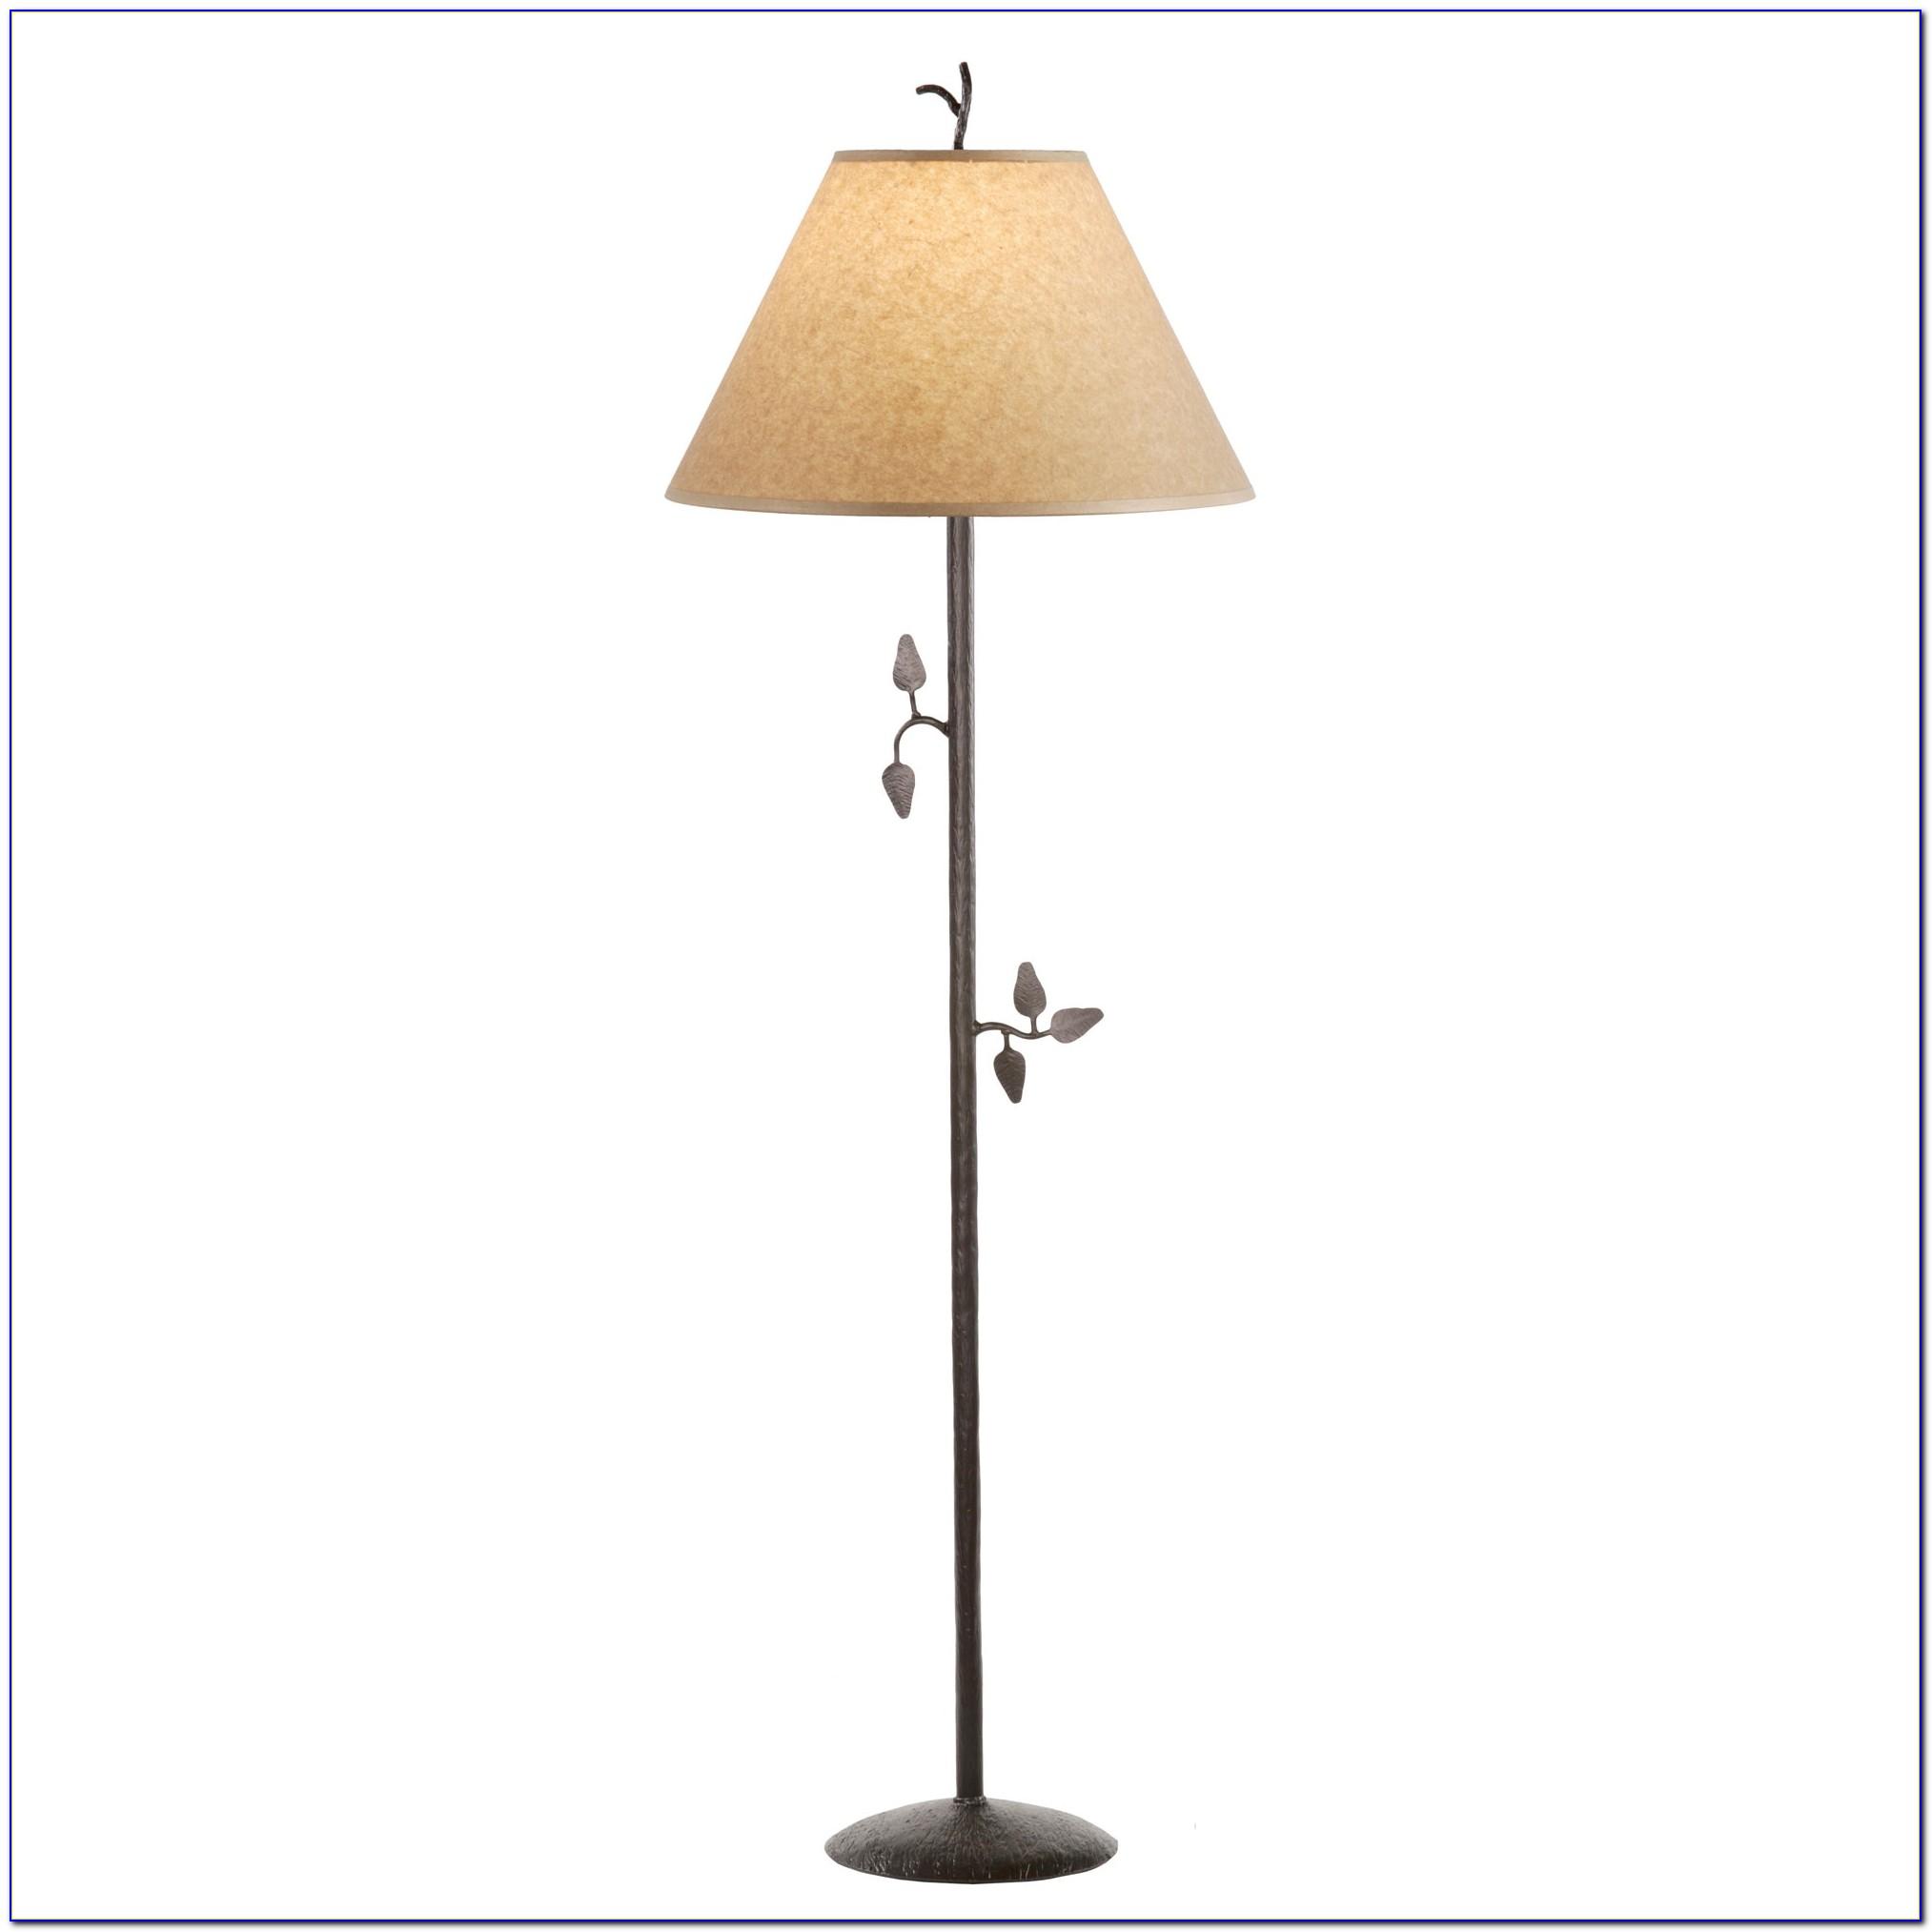 Wrought Iron Floor Lamp Stands